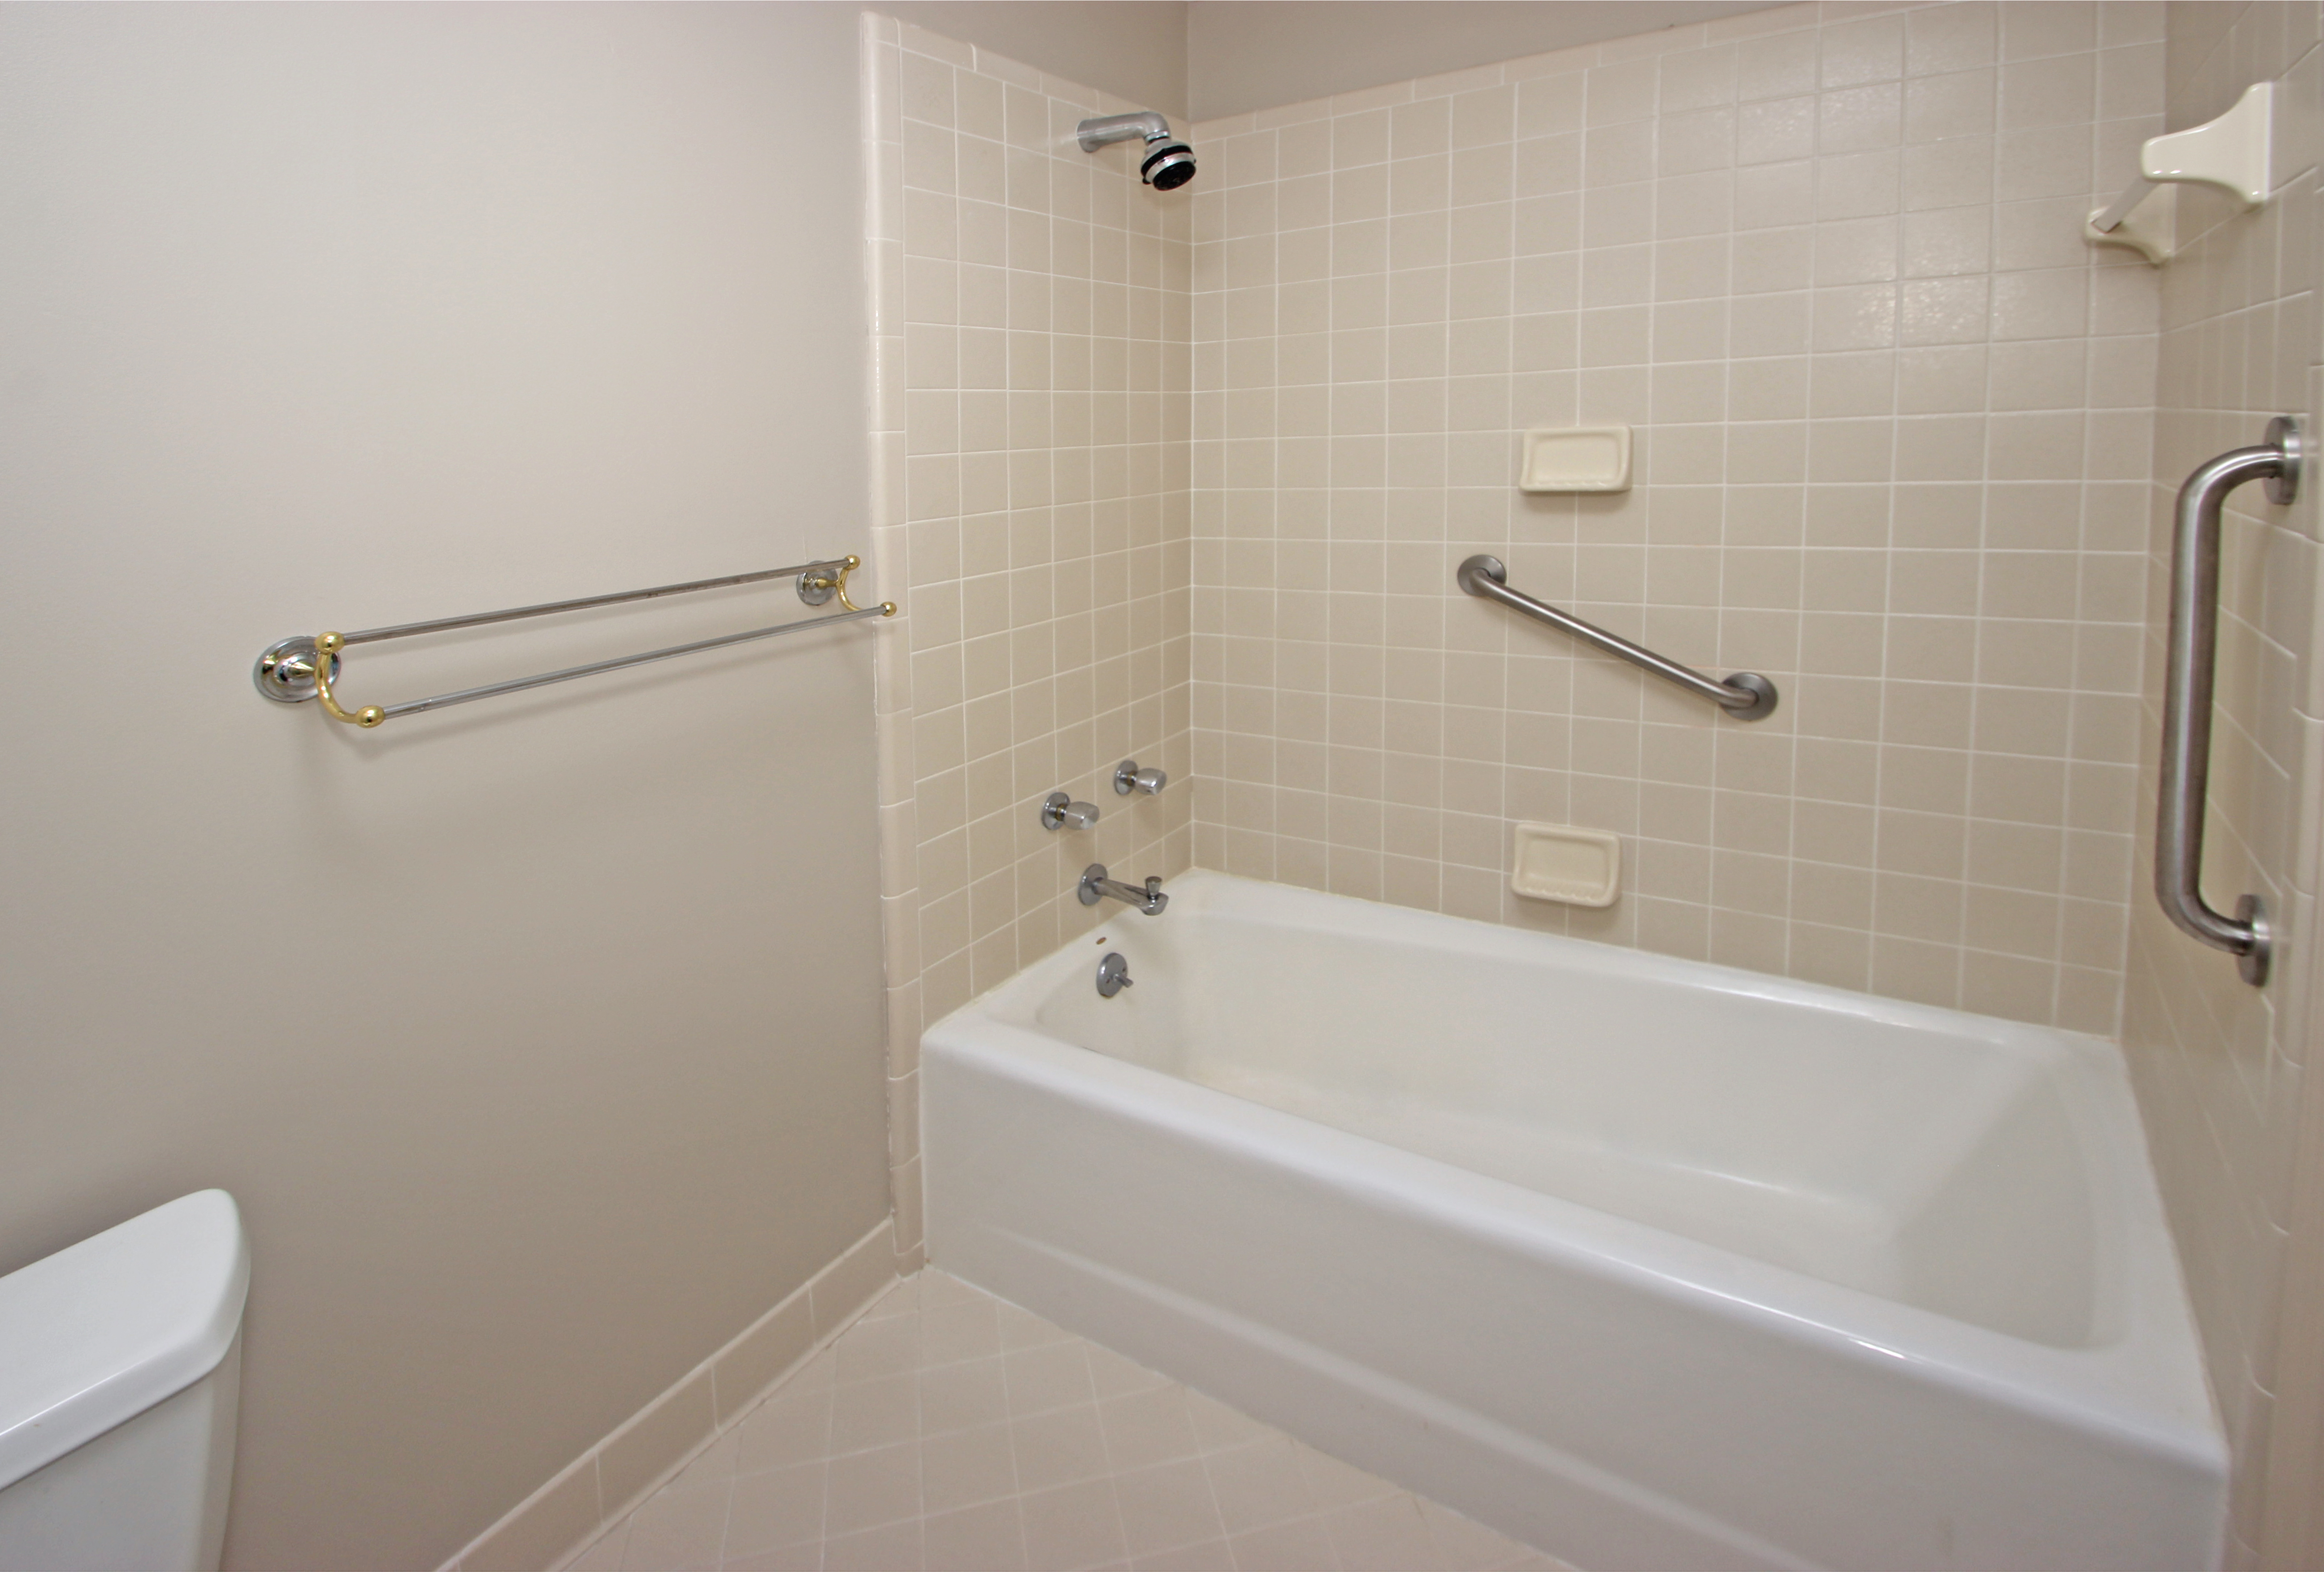 HI -Guest bath - 2nd level 2